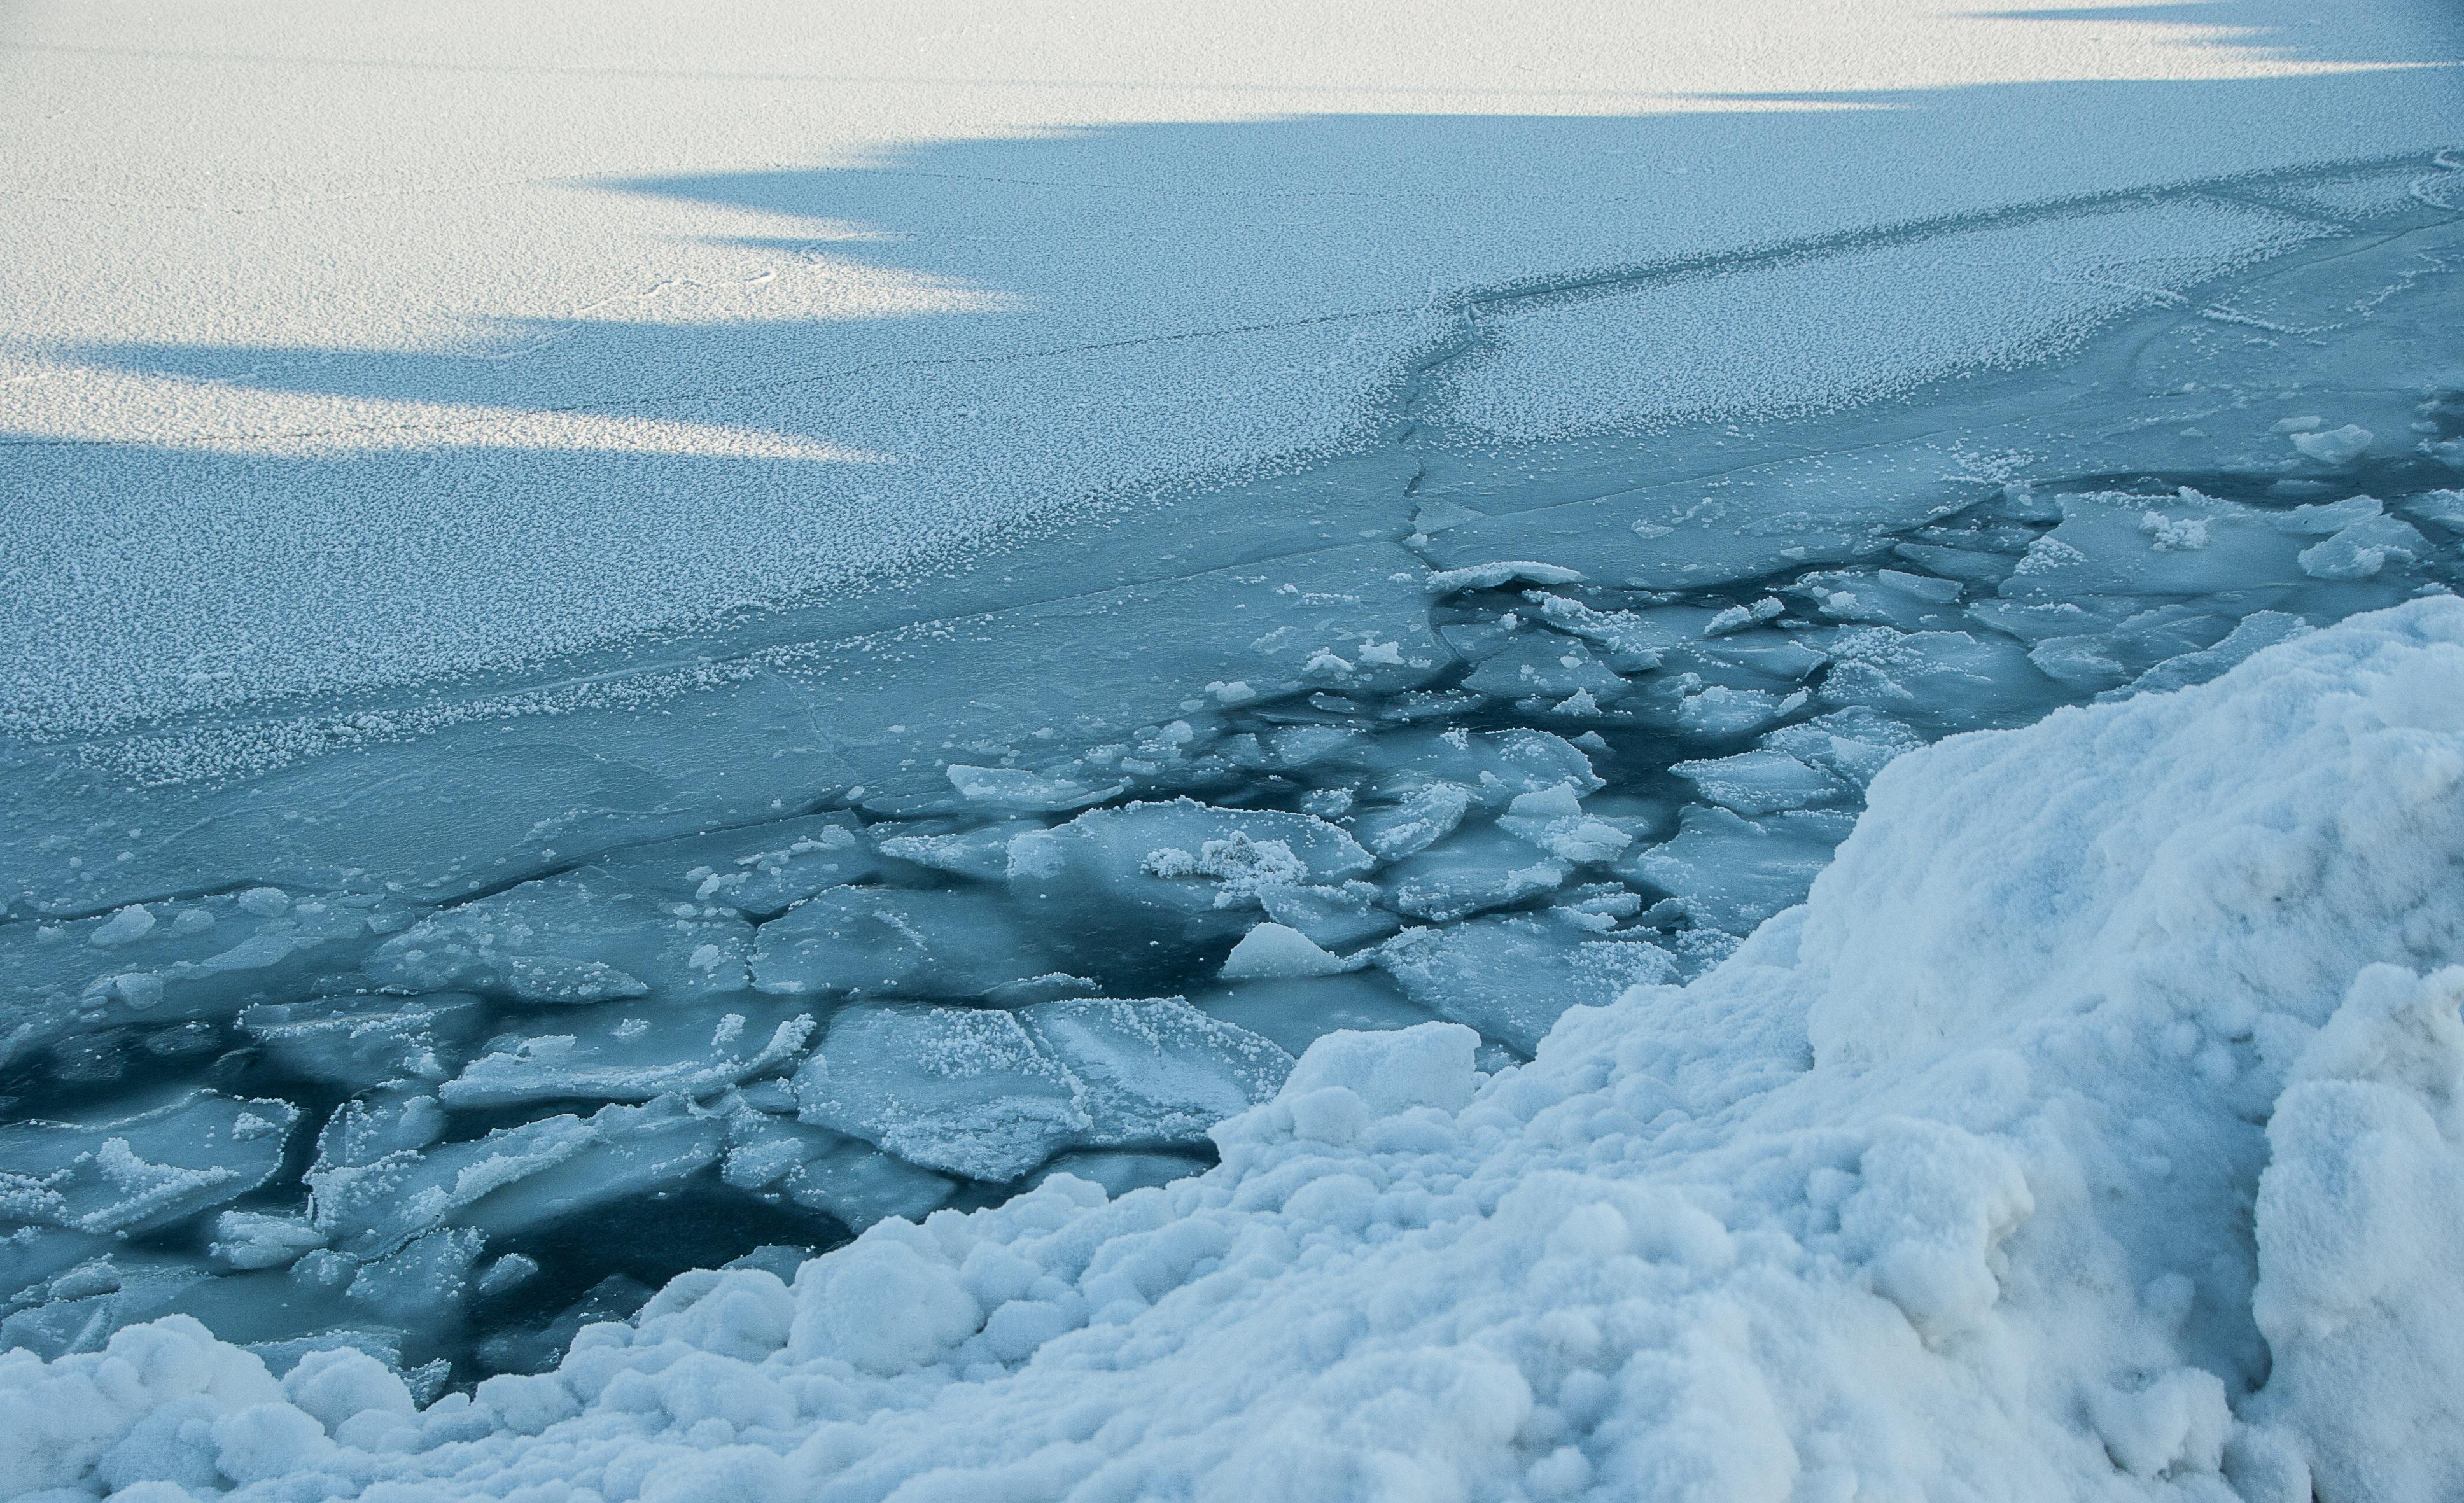 snow winter seasons sea - photo #4